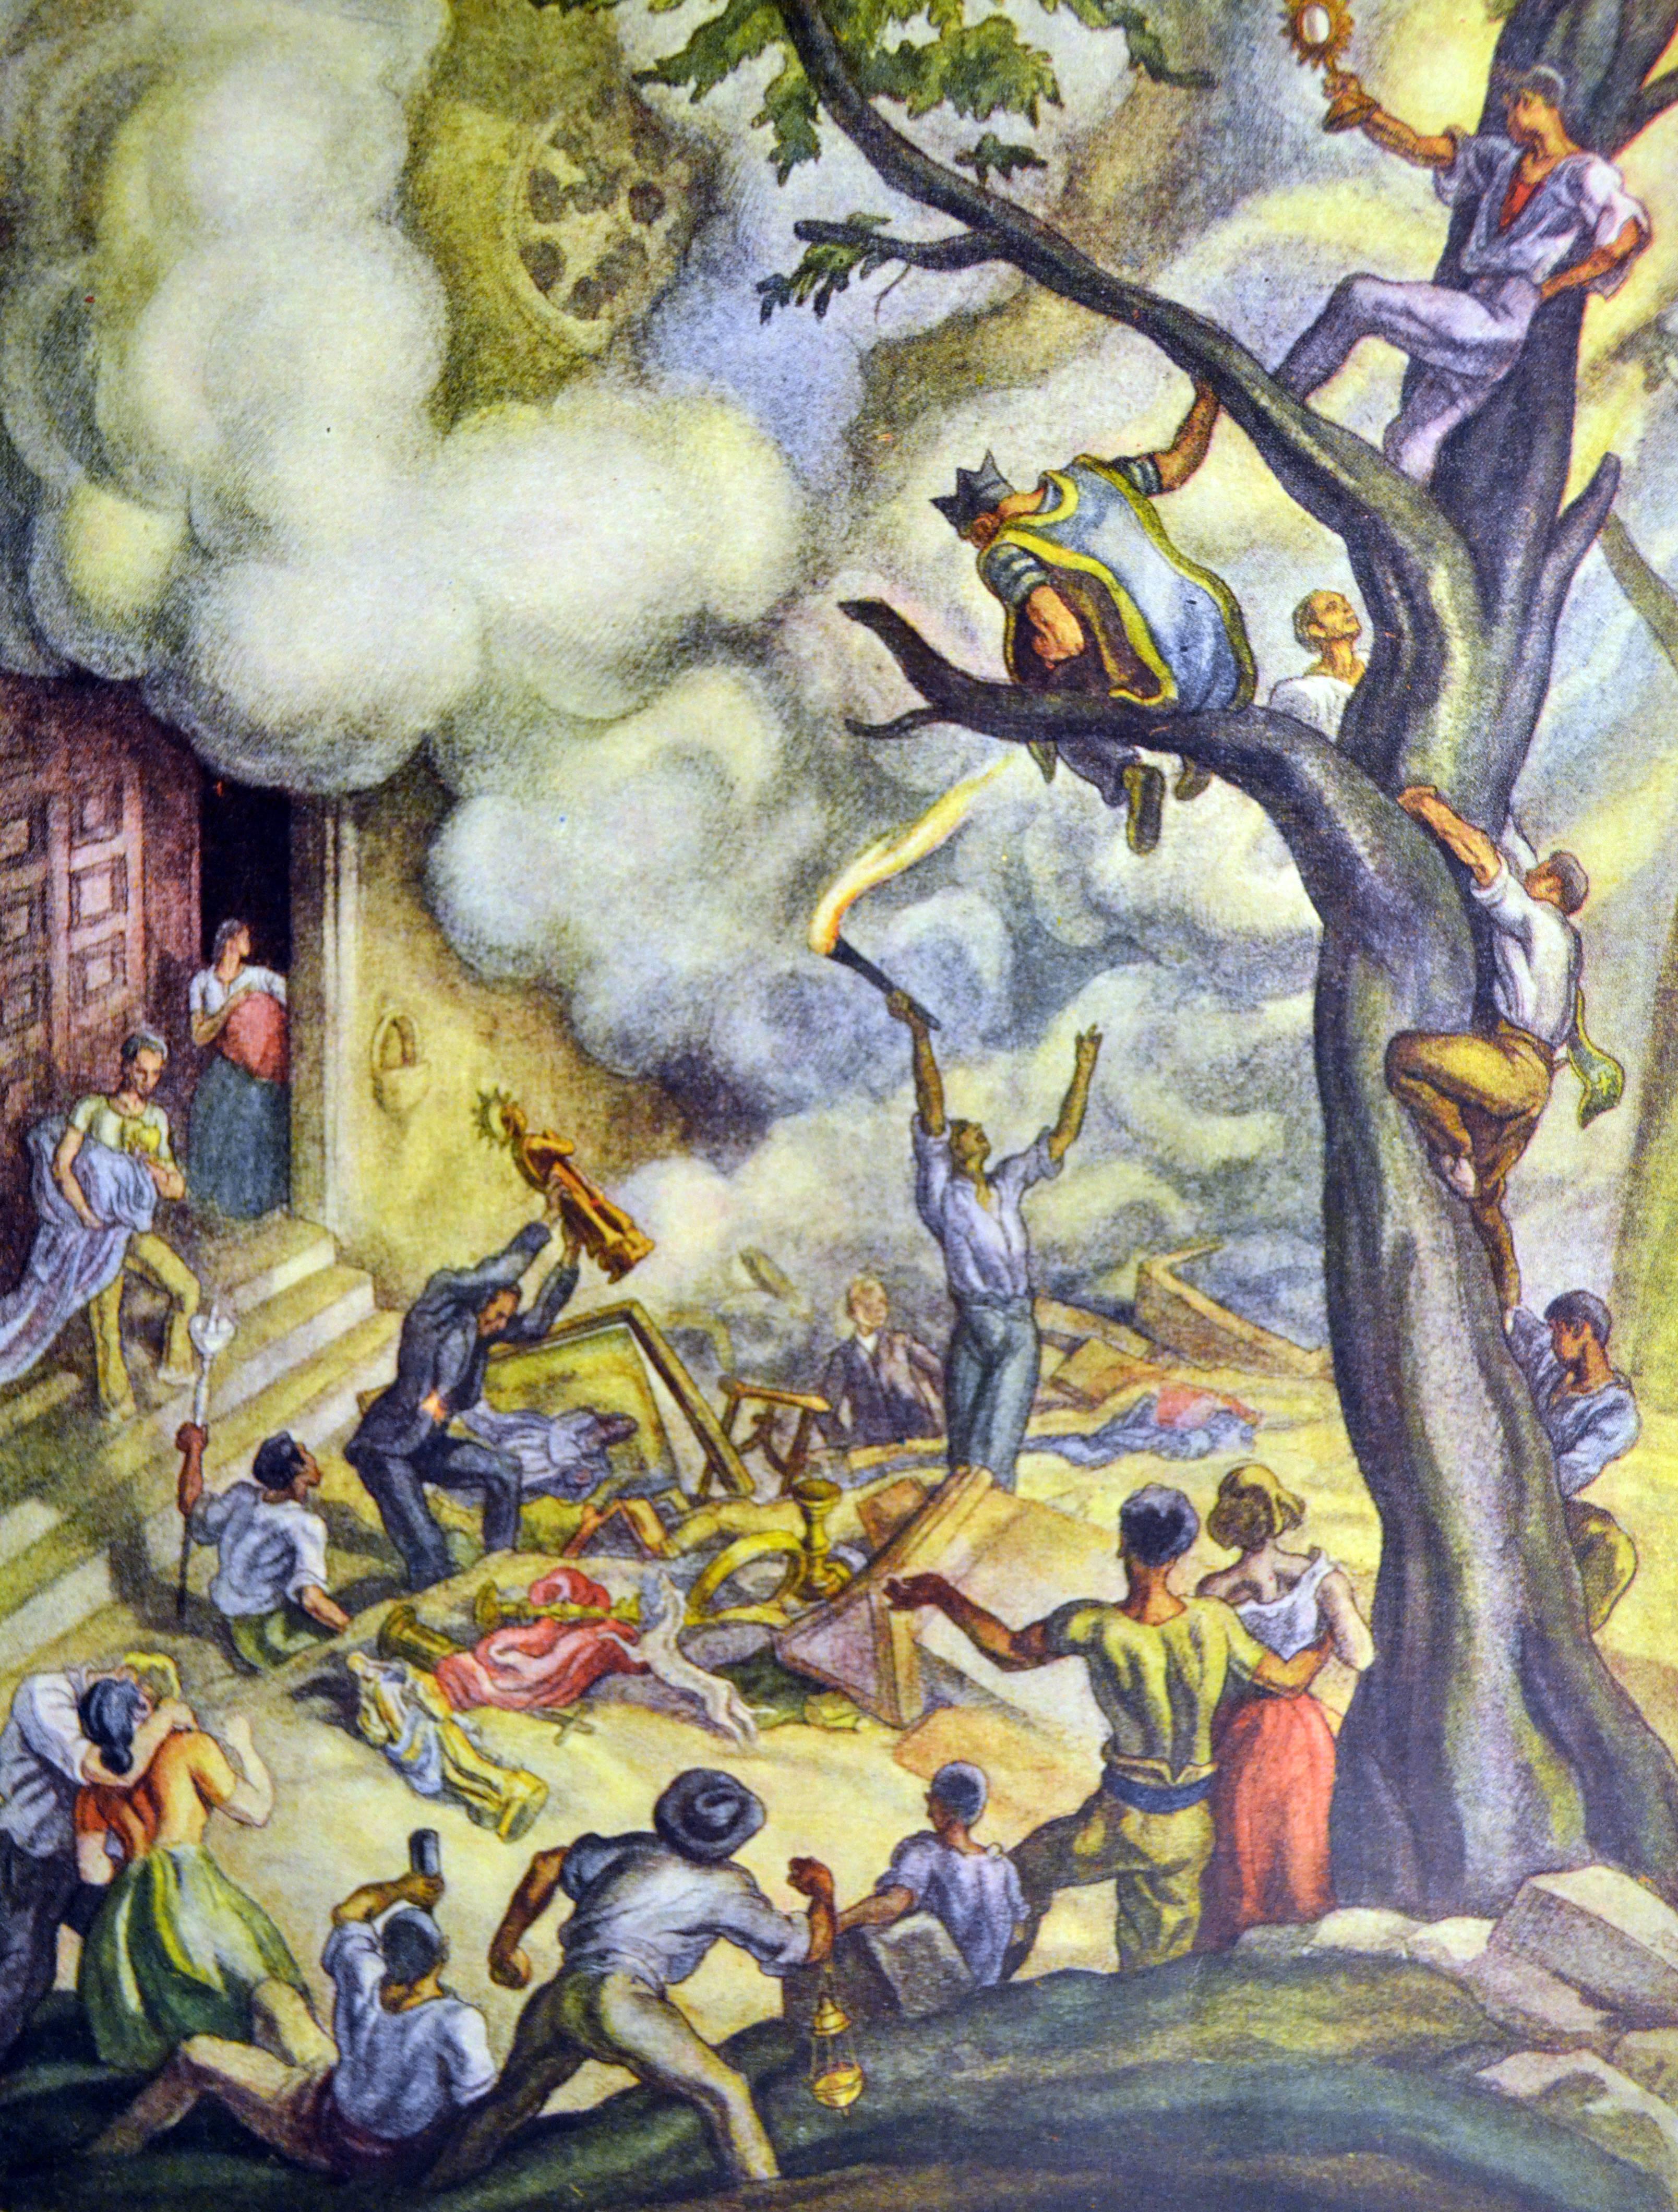 'Spanish civil war: burning convents', by Carlos Sáenz de Tejada.